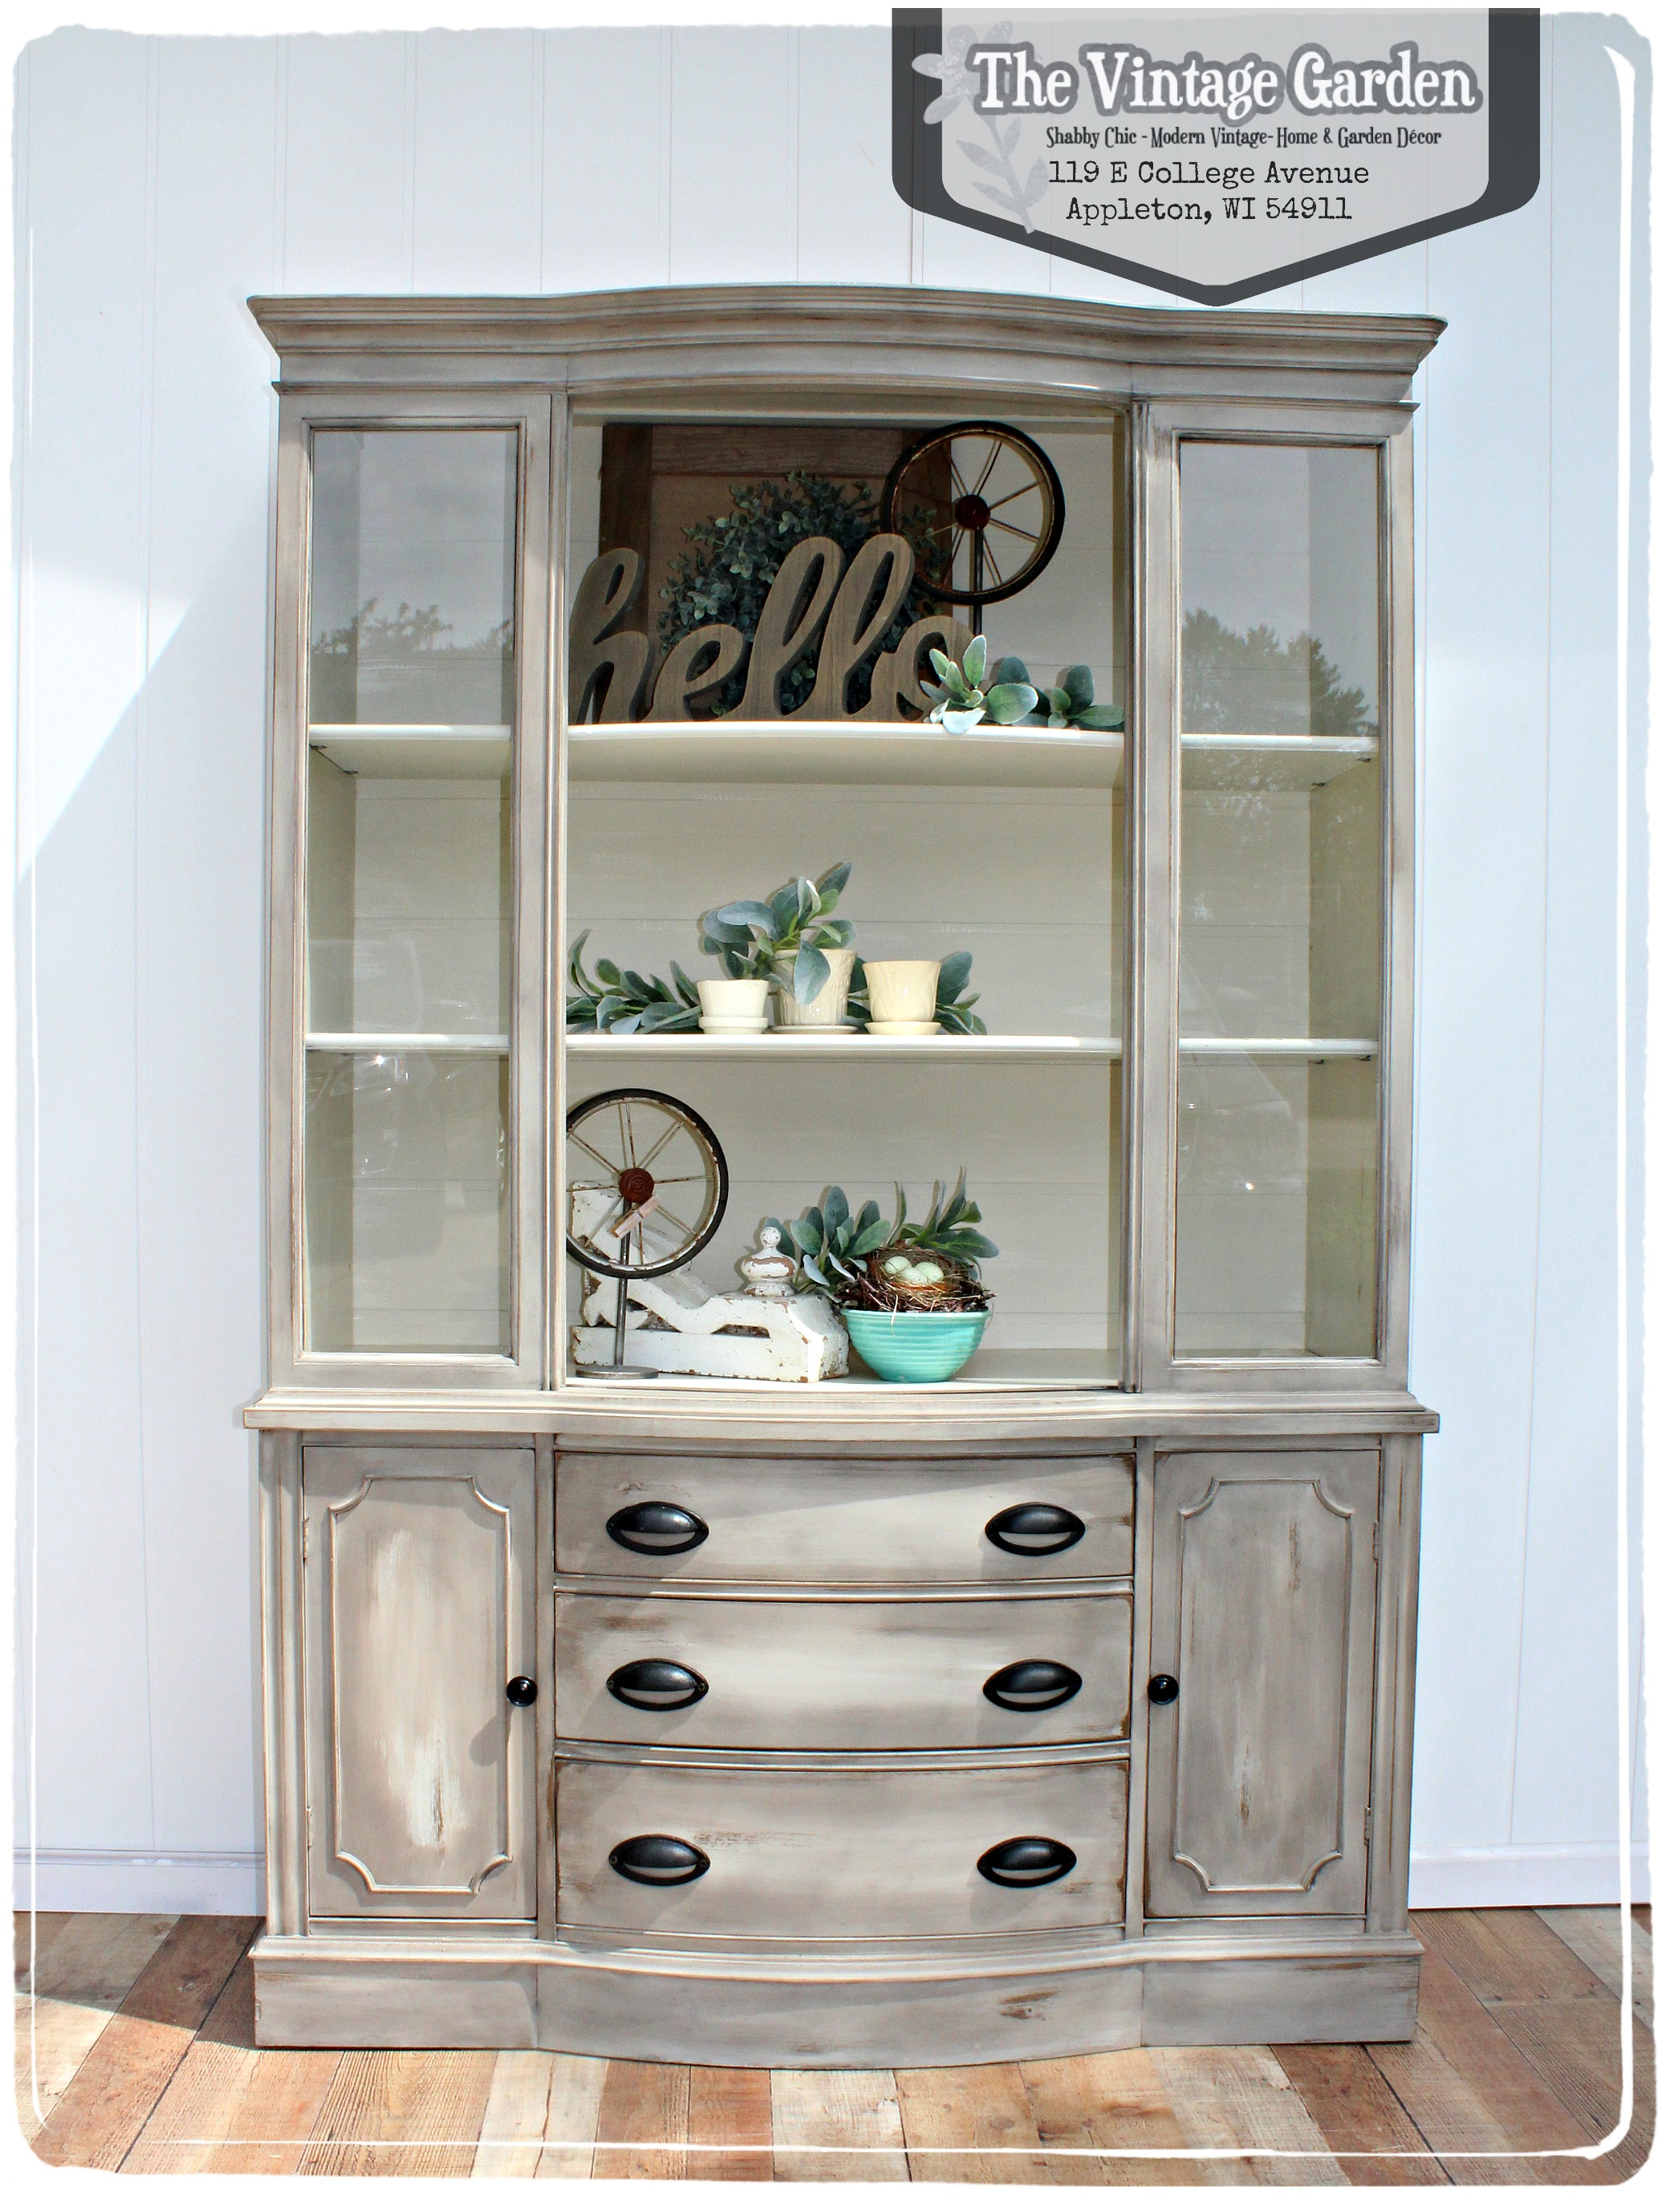 Hand painted, vintage furniture...